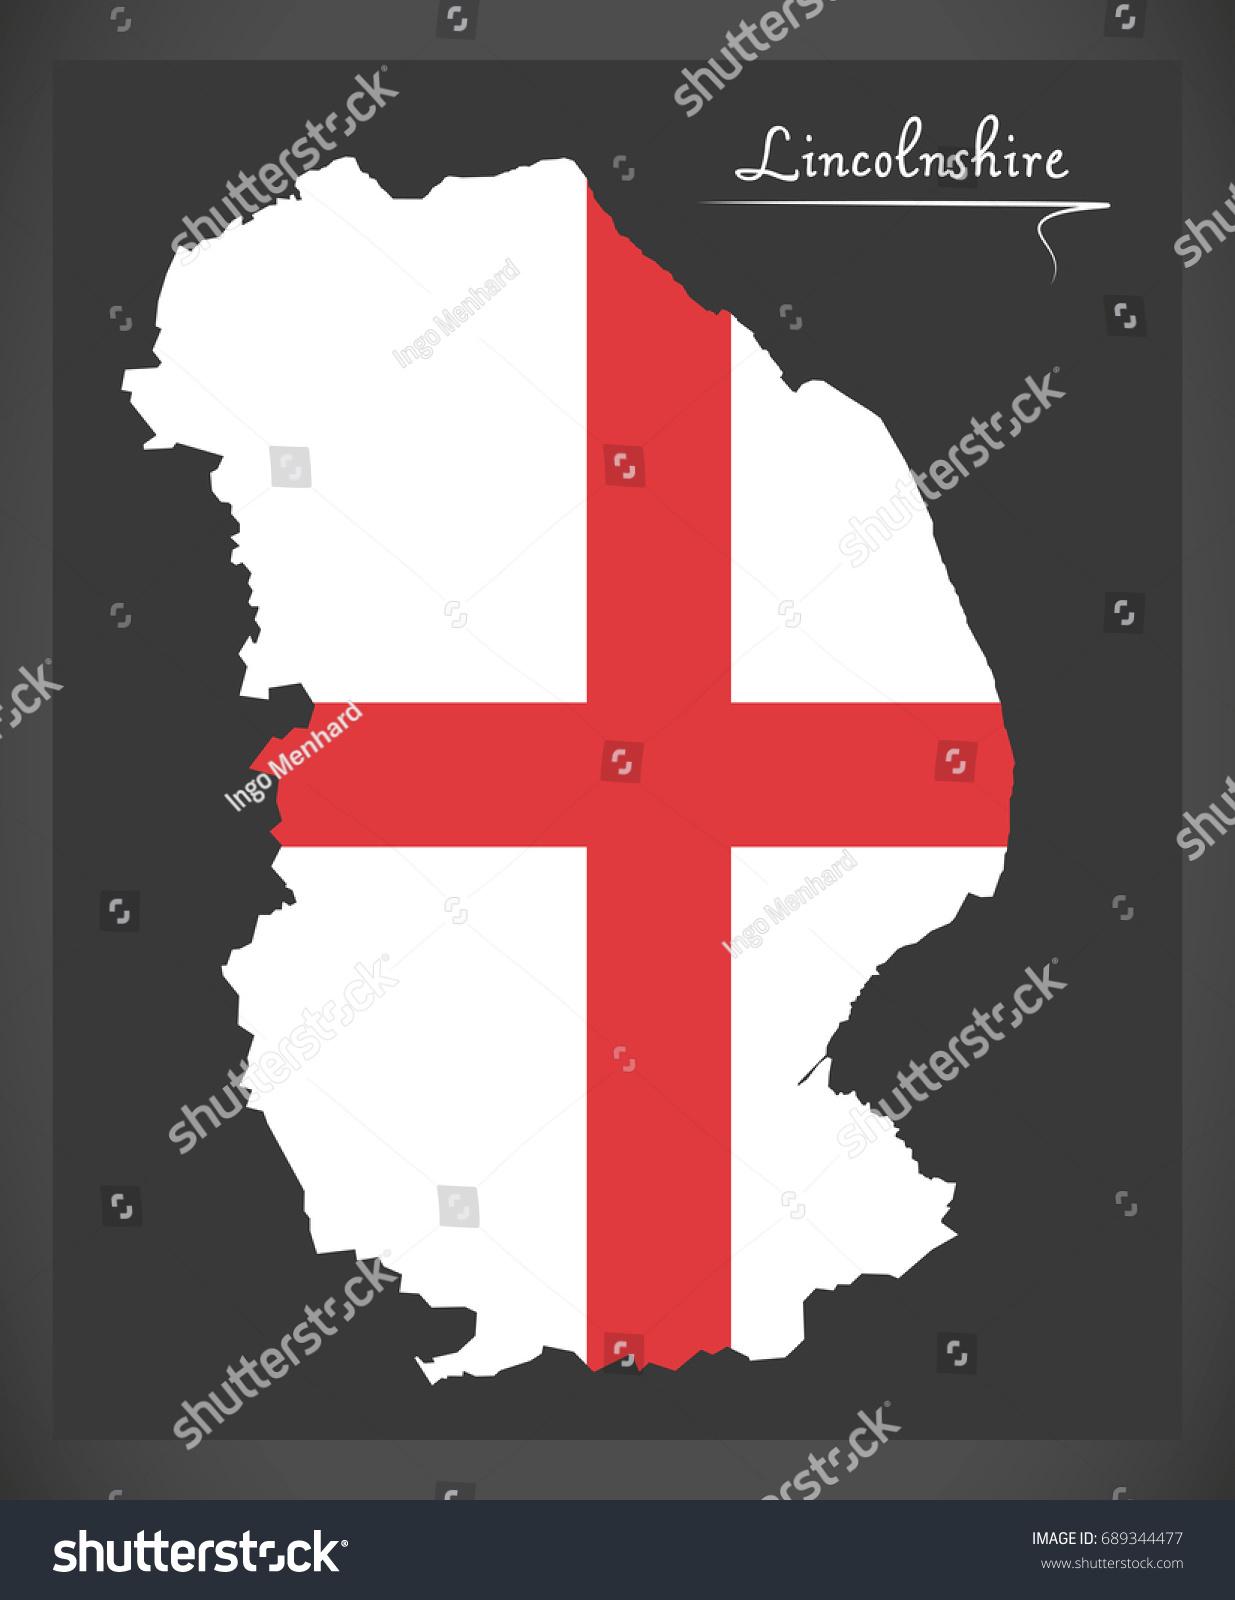 Map Of England Lincolnshire.Lincolnshire Map England Uk English National Stock Vector Royalty